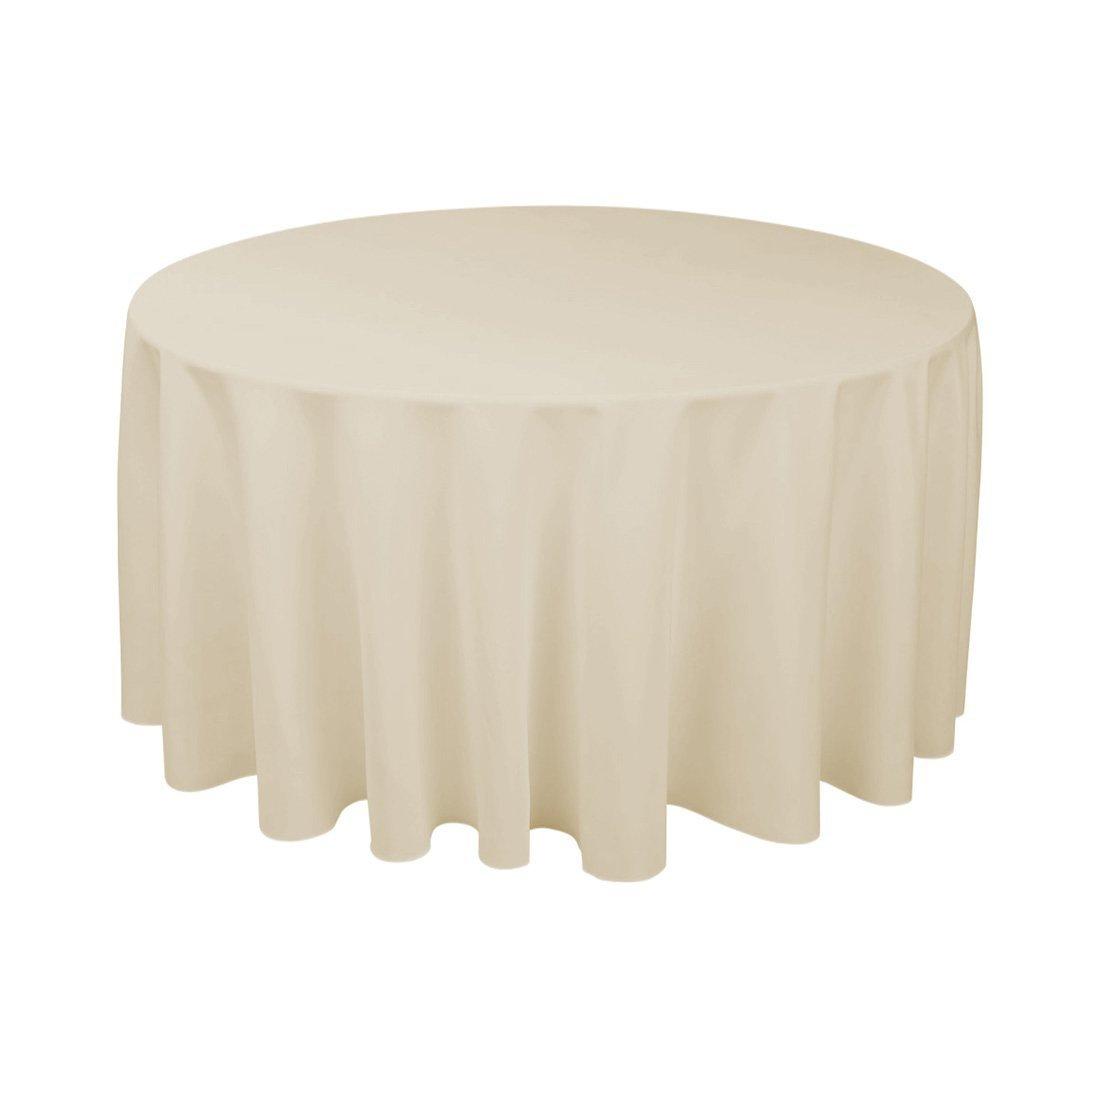 Beige Round Tablecloth